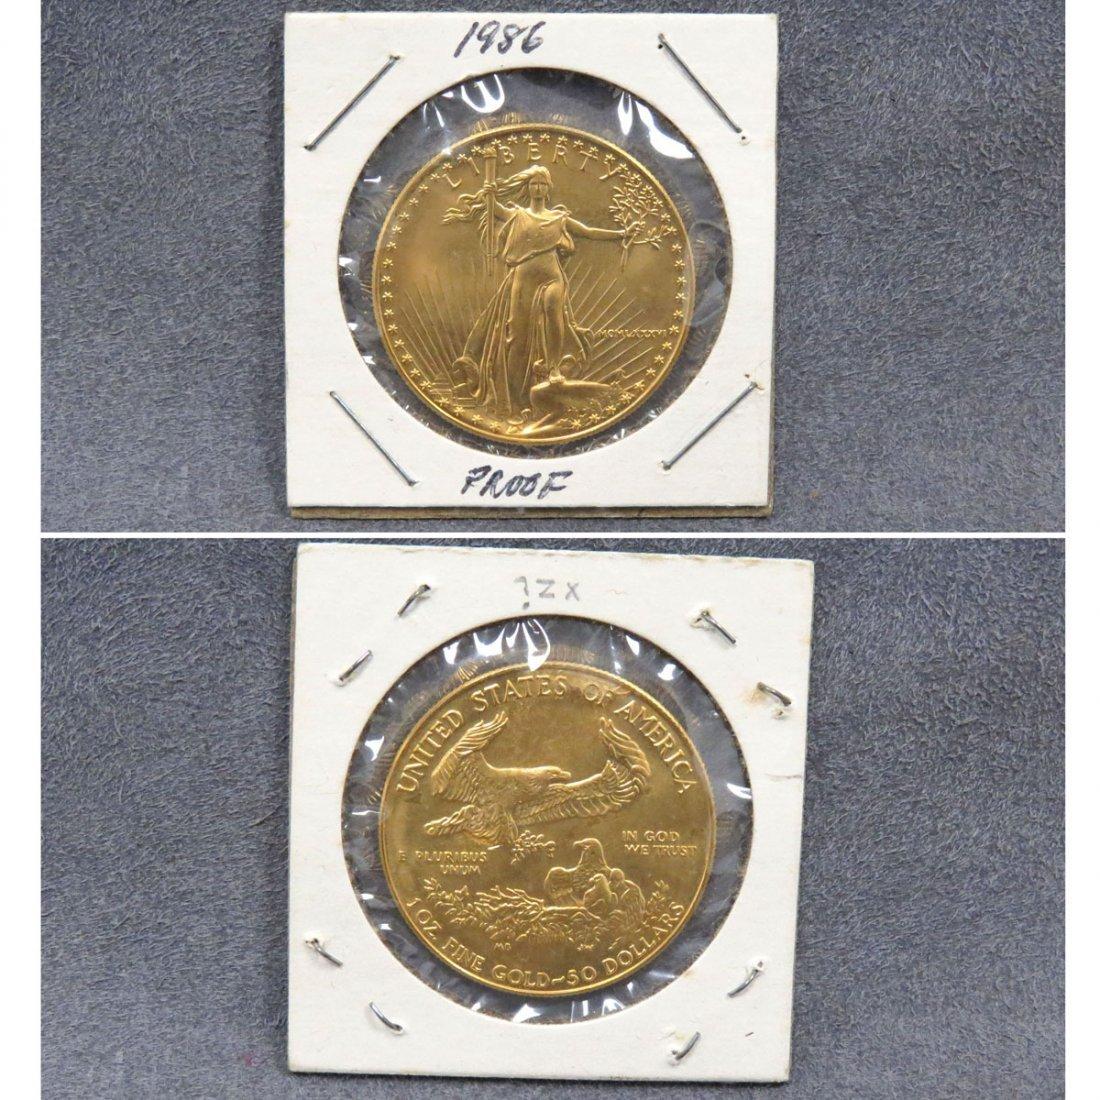 1986 US $50.00 GOLD EAGLE COIN